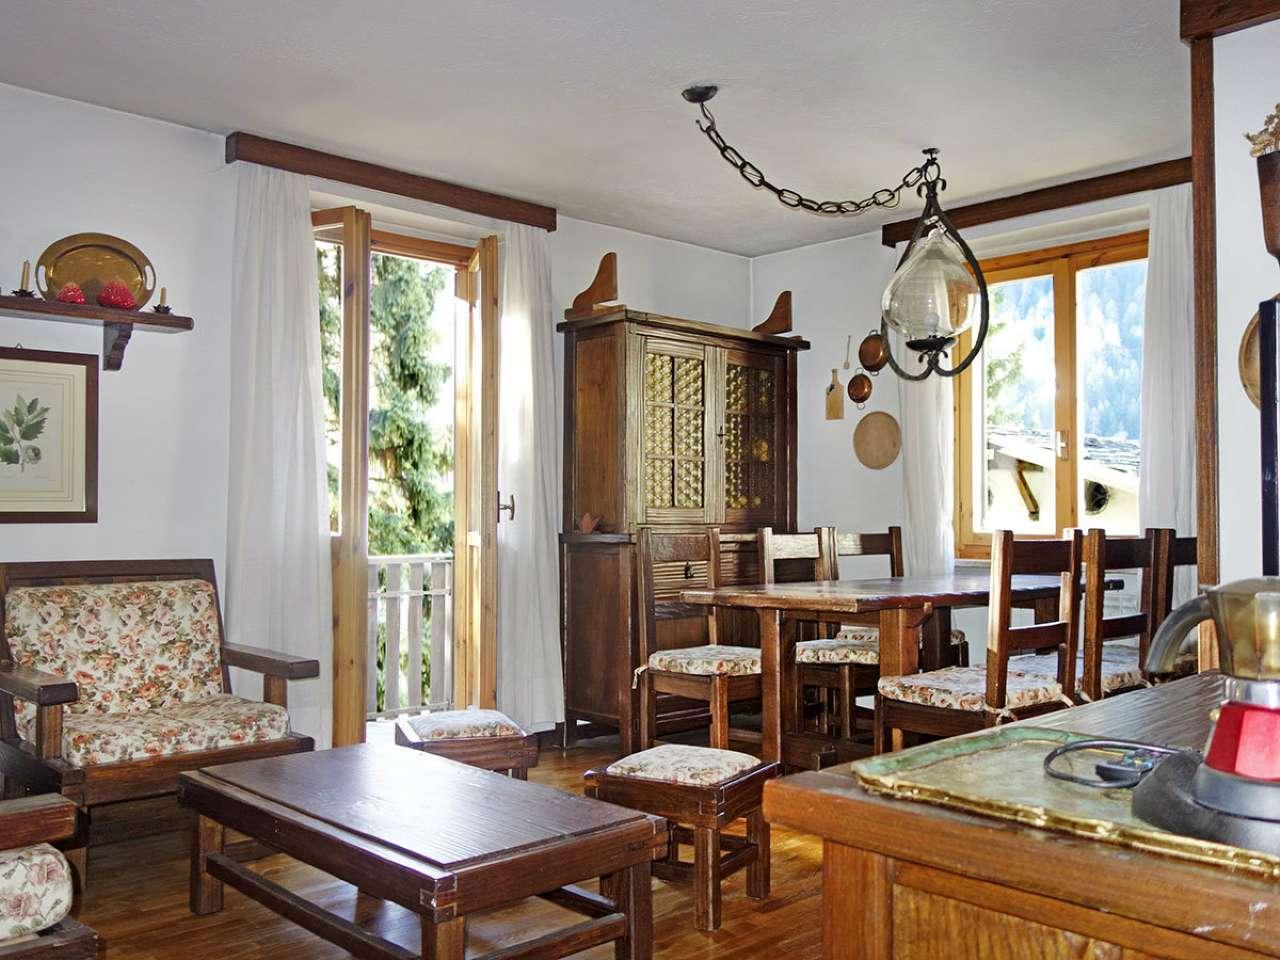 Stunning Azienda Soggiorno Courmayeur Photos - Embercreative.us ...